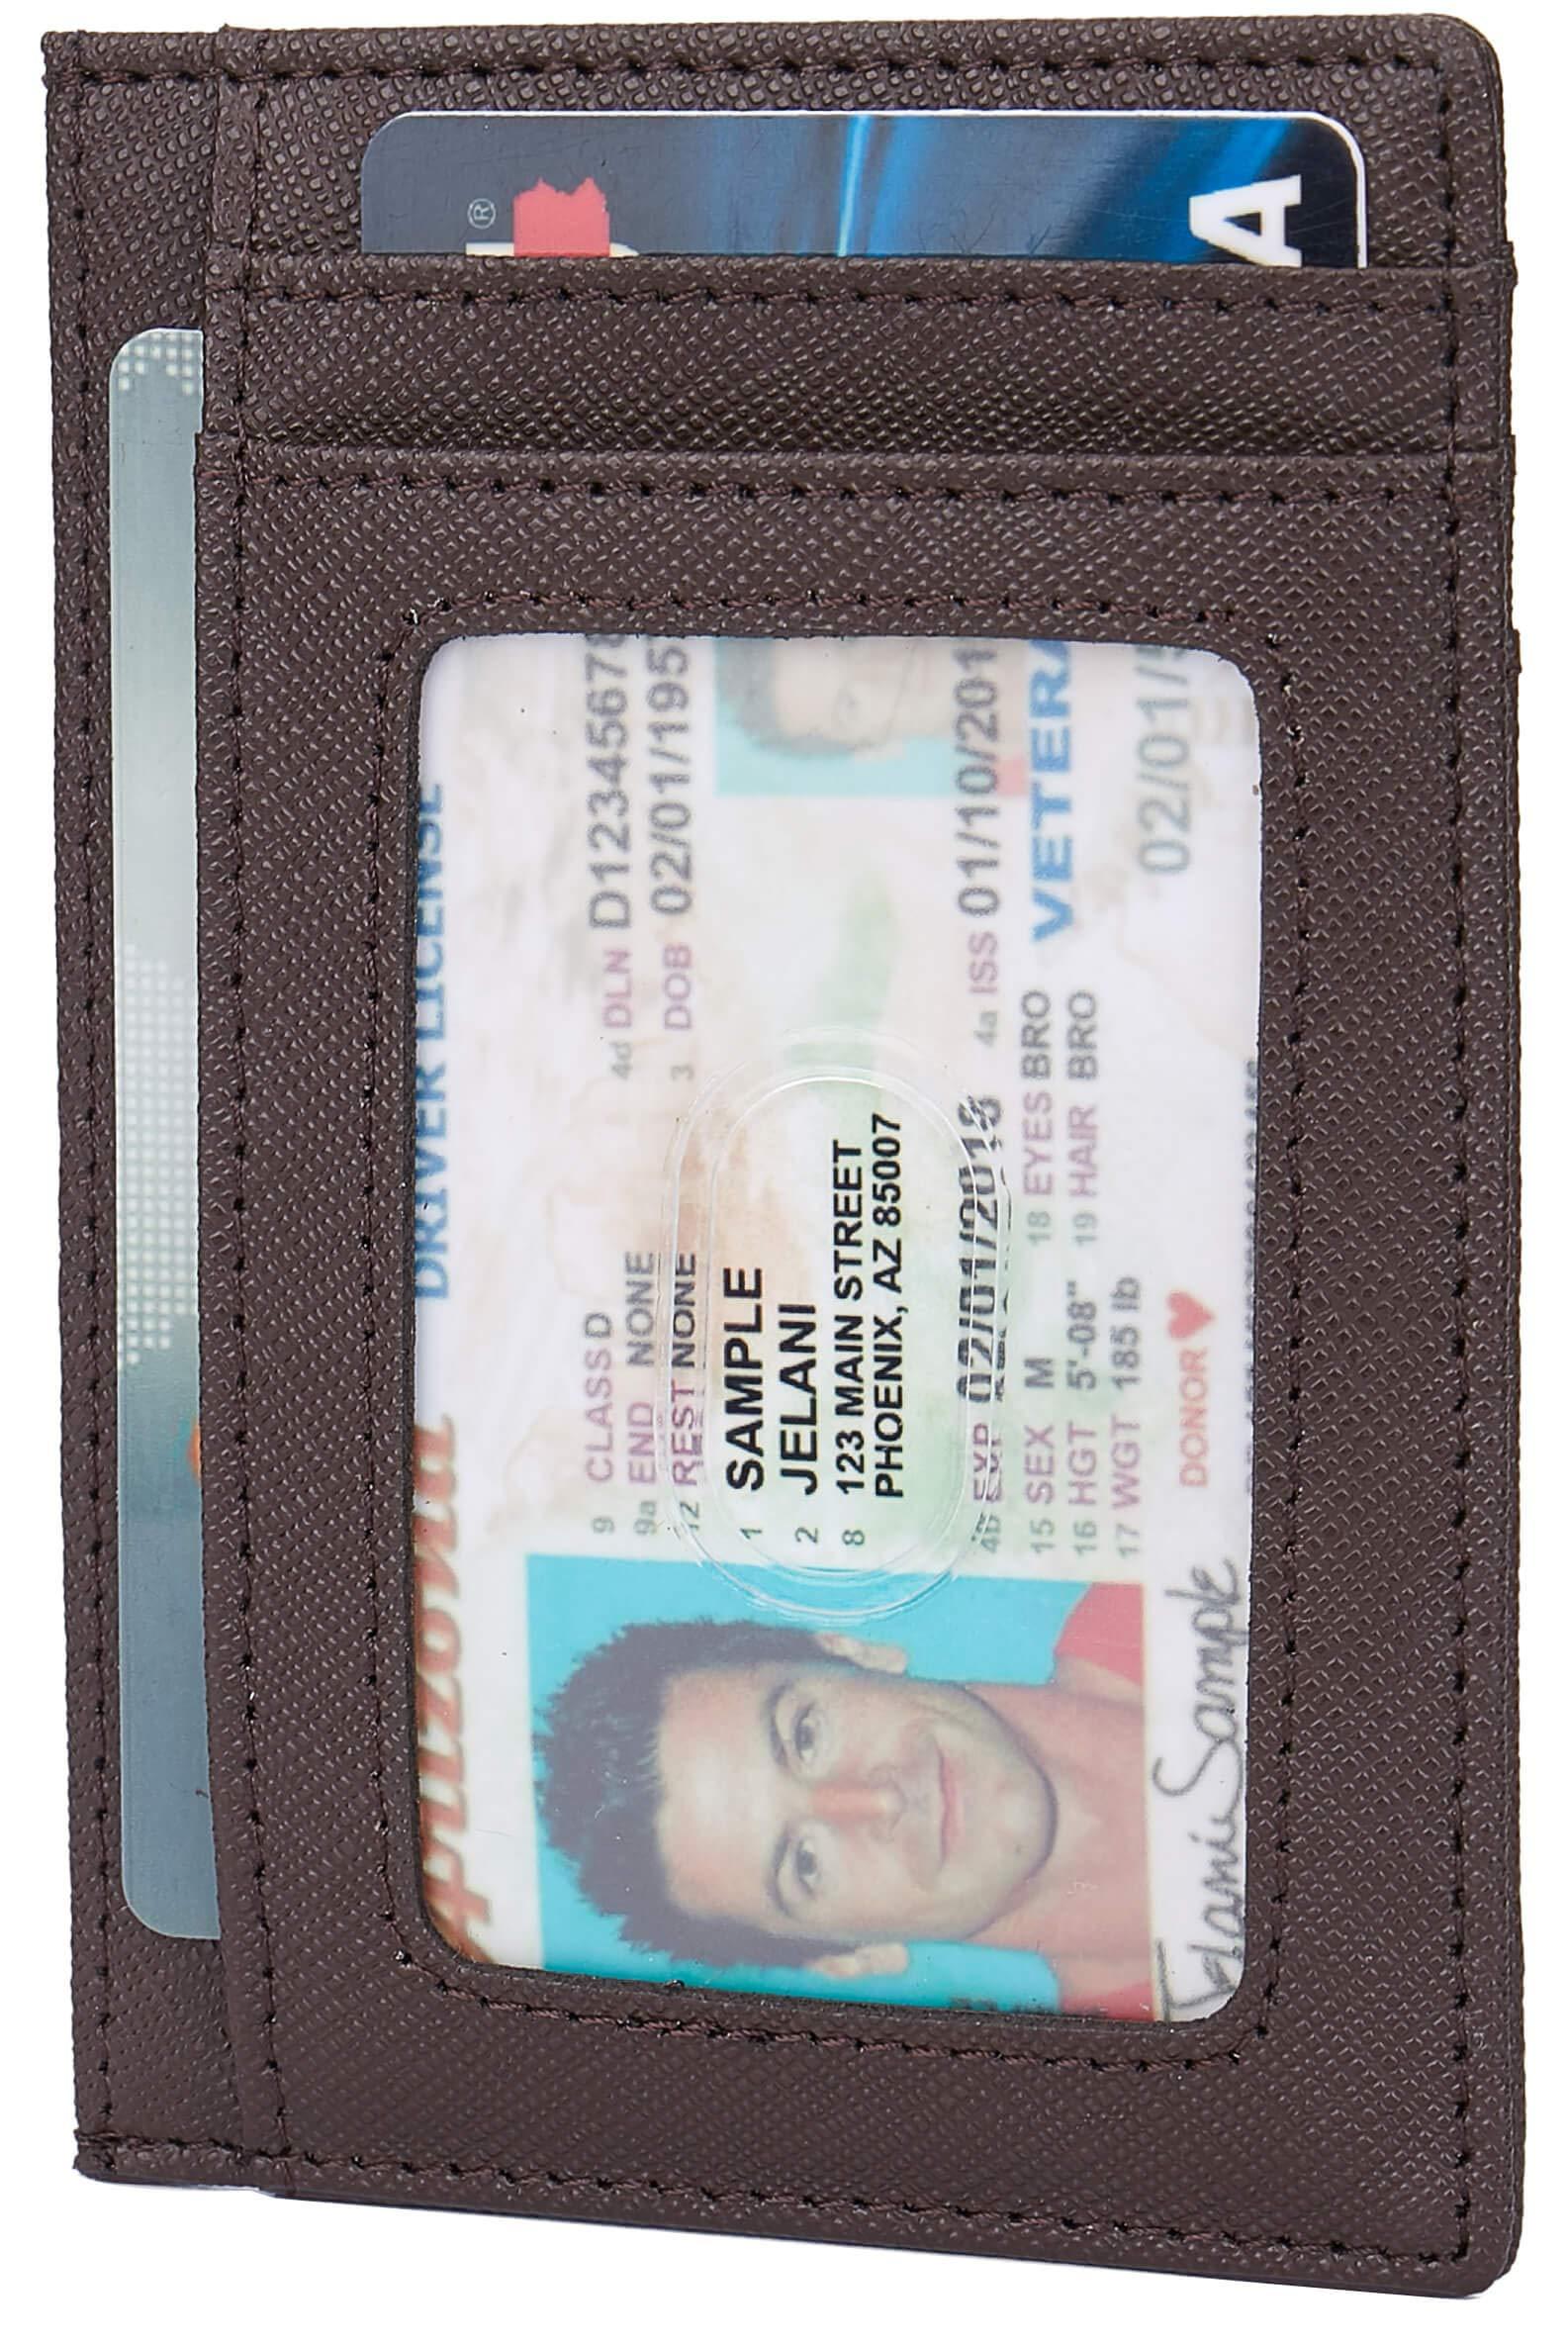 Linscra Small RFID Blocking Minimalist Credit Card Holder Pocket Wallets for Men & Women, Crosshatch Leather Coffee by Linscra